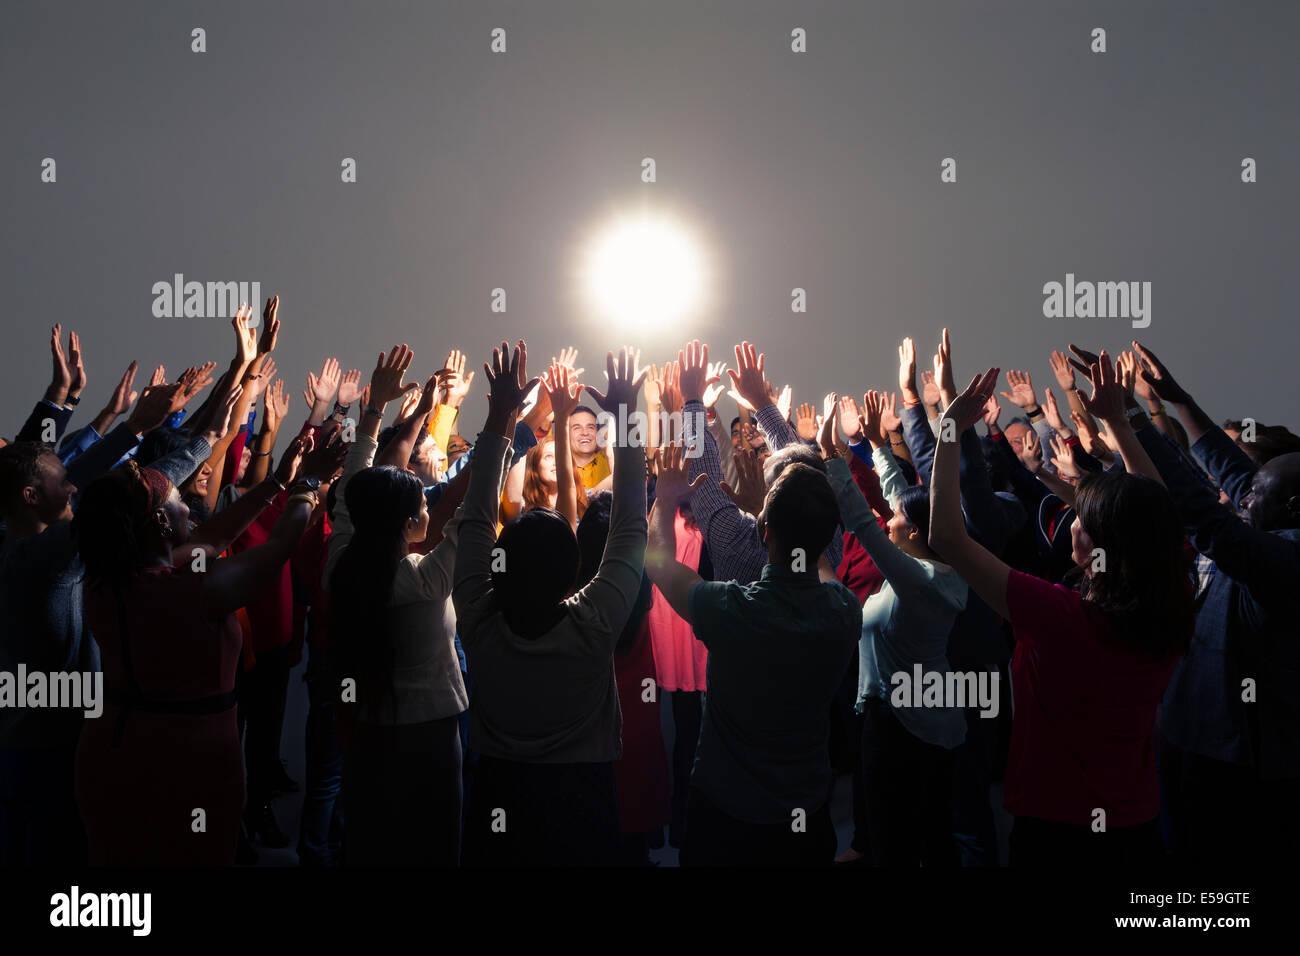 Diverse crowd with arms raised around bright light Stock Photo